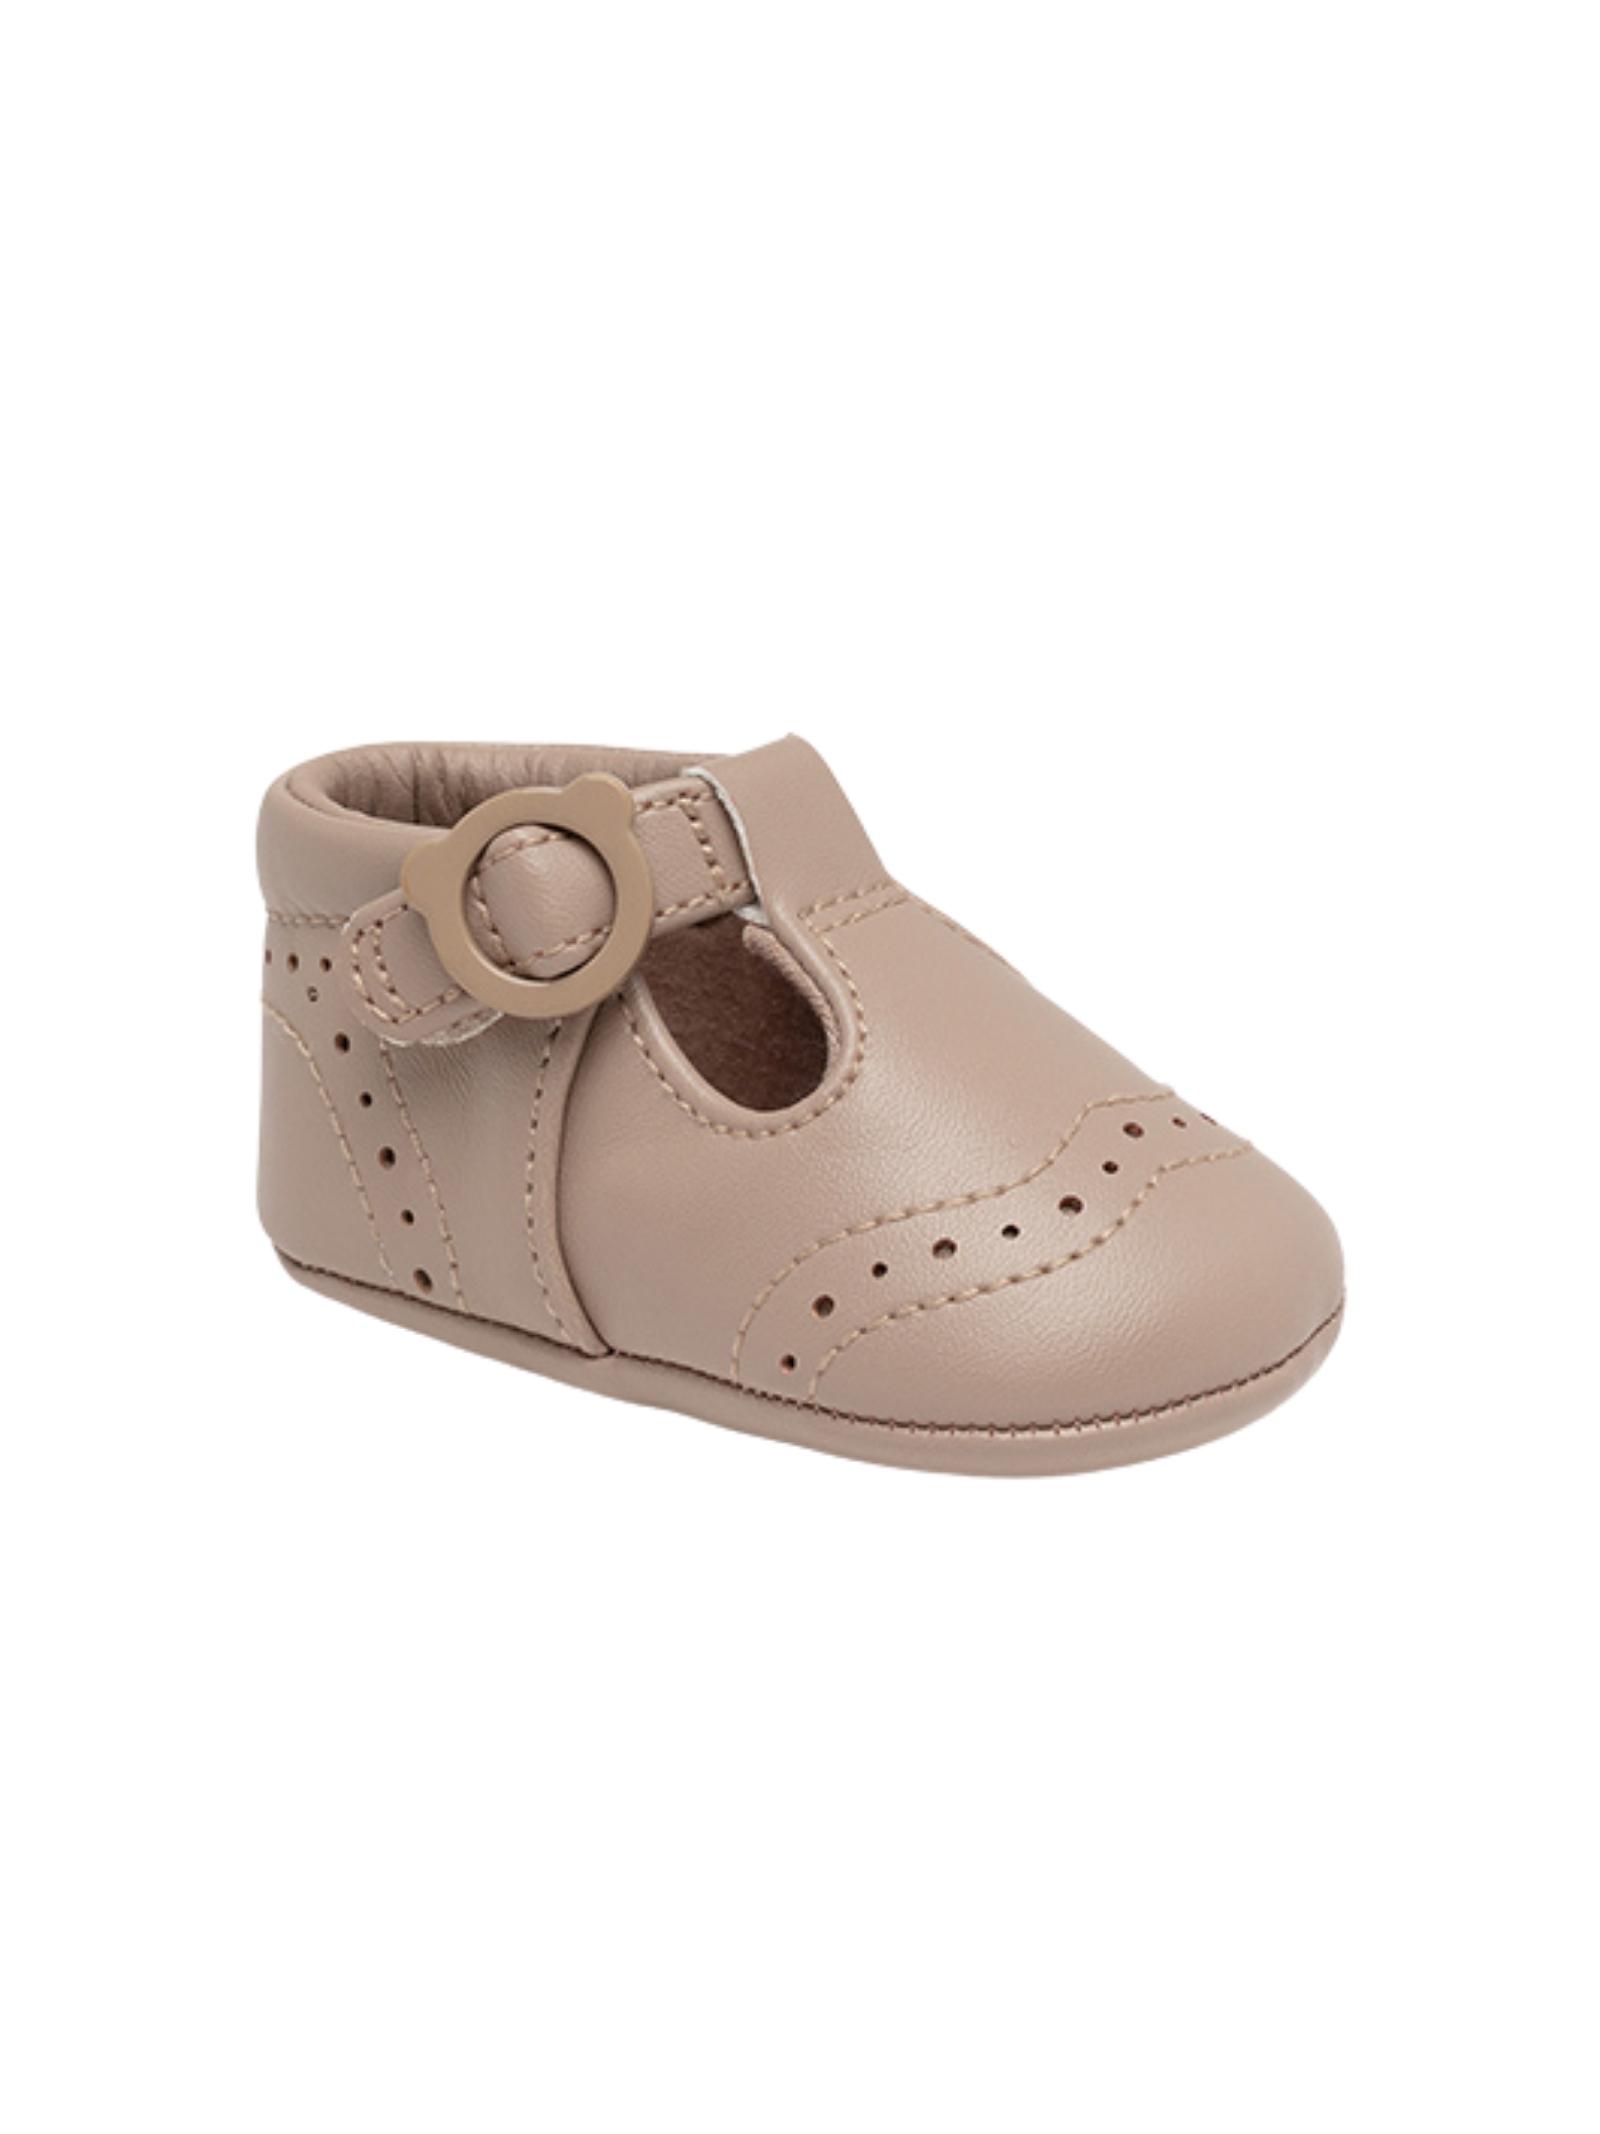 Inglesina Newborn shoes MAYORAL NEWBORN | Shoes | 9447041